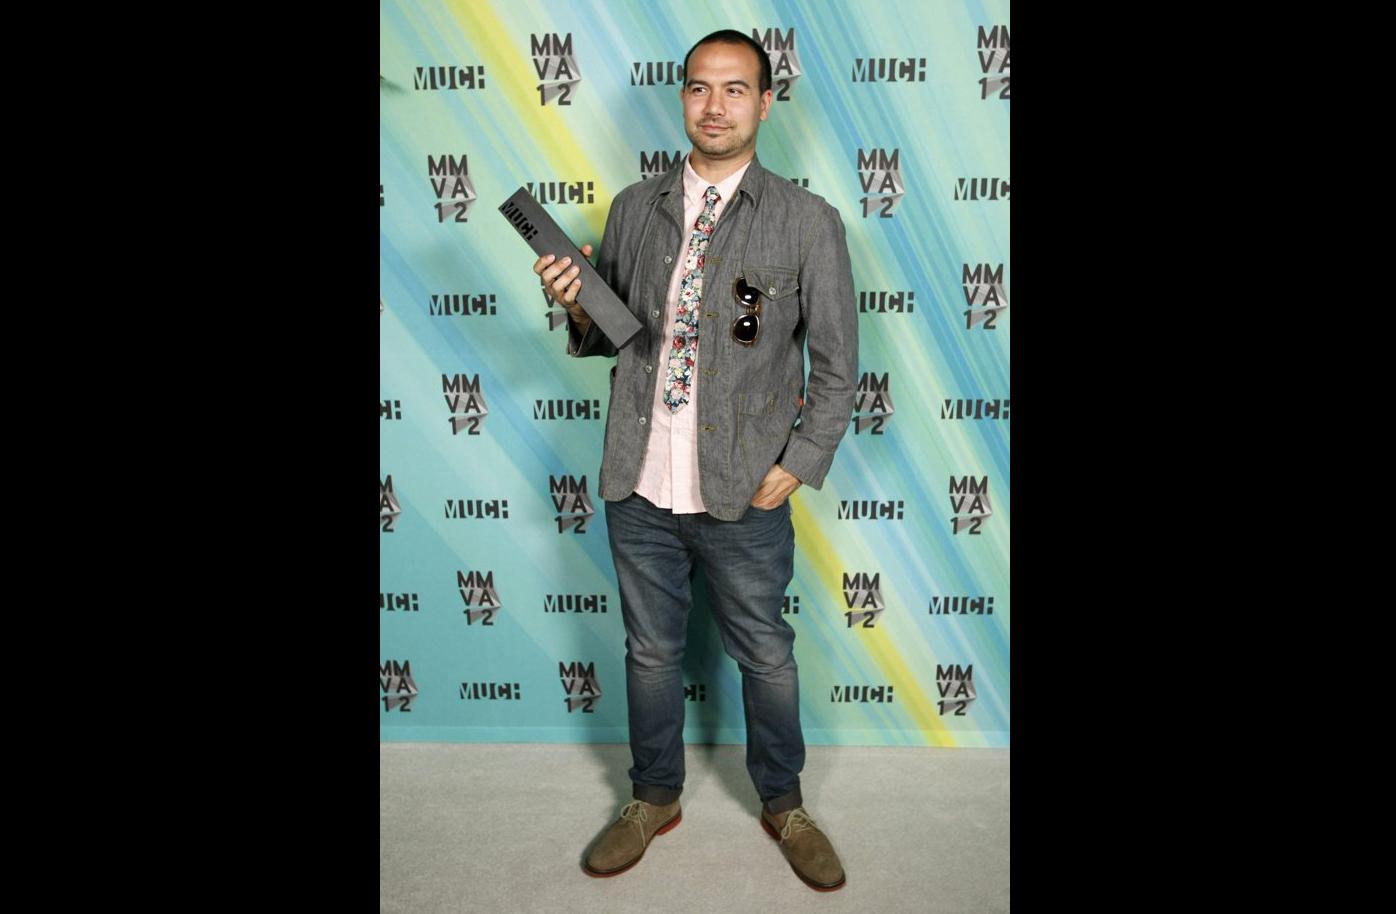 Twist Director Wins At 2012 MuchMusic Video Awards